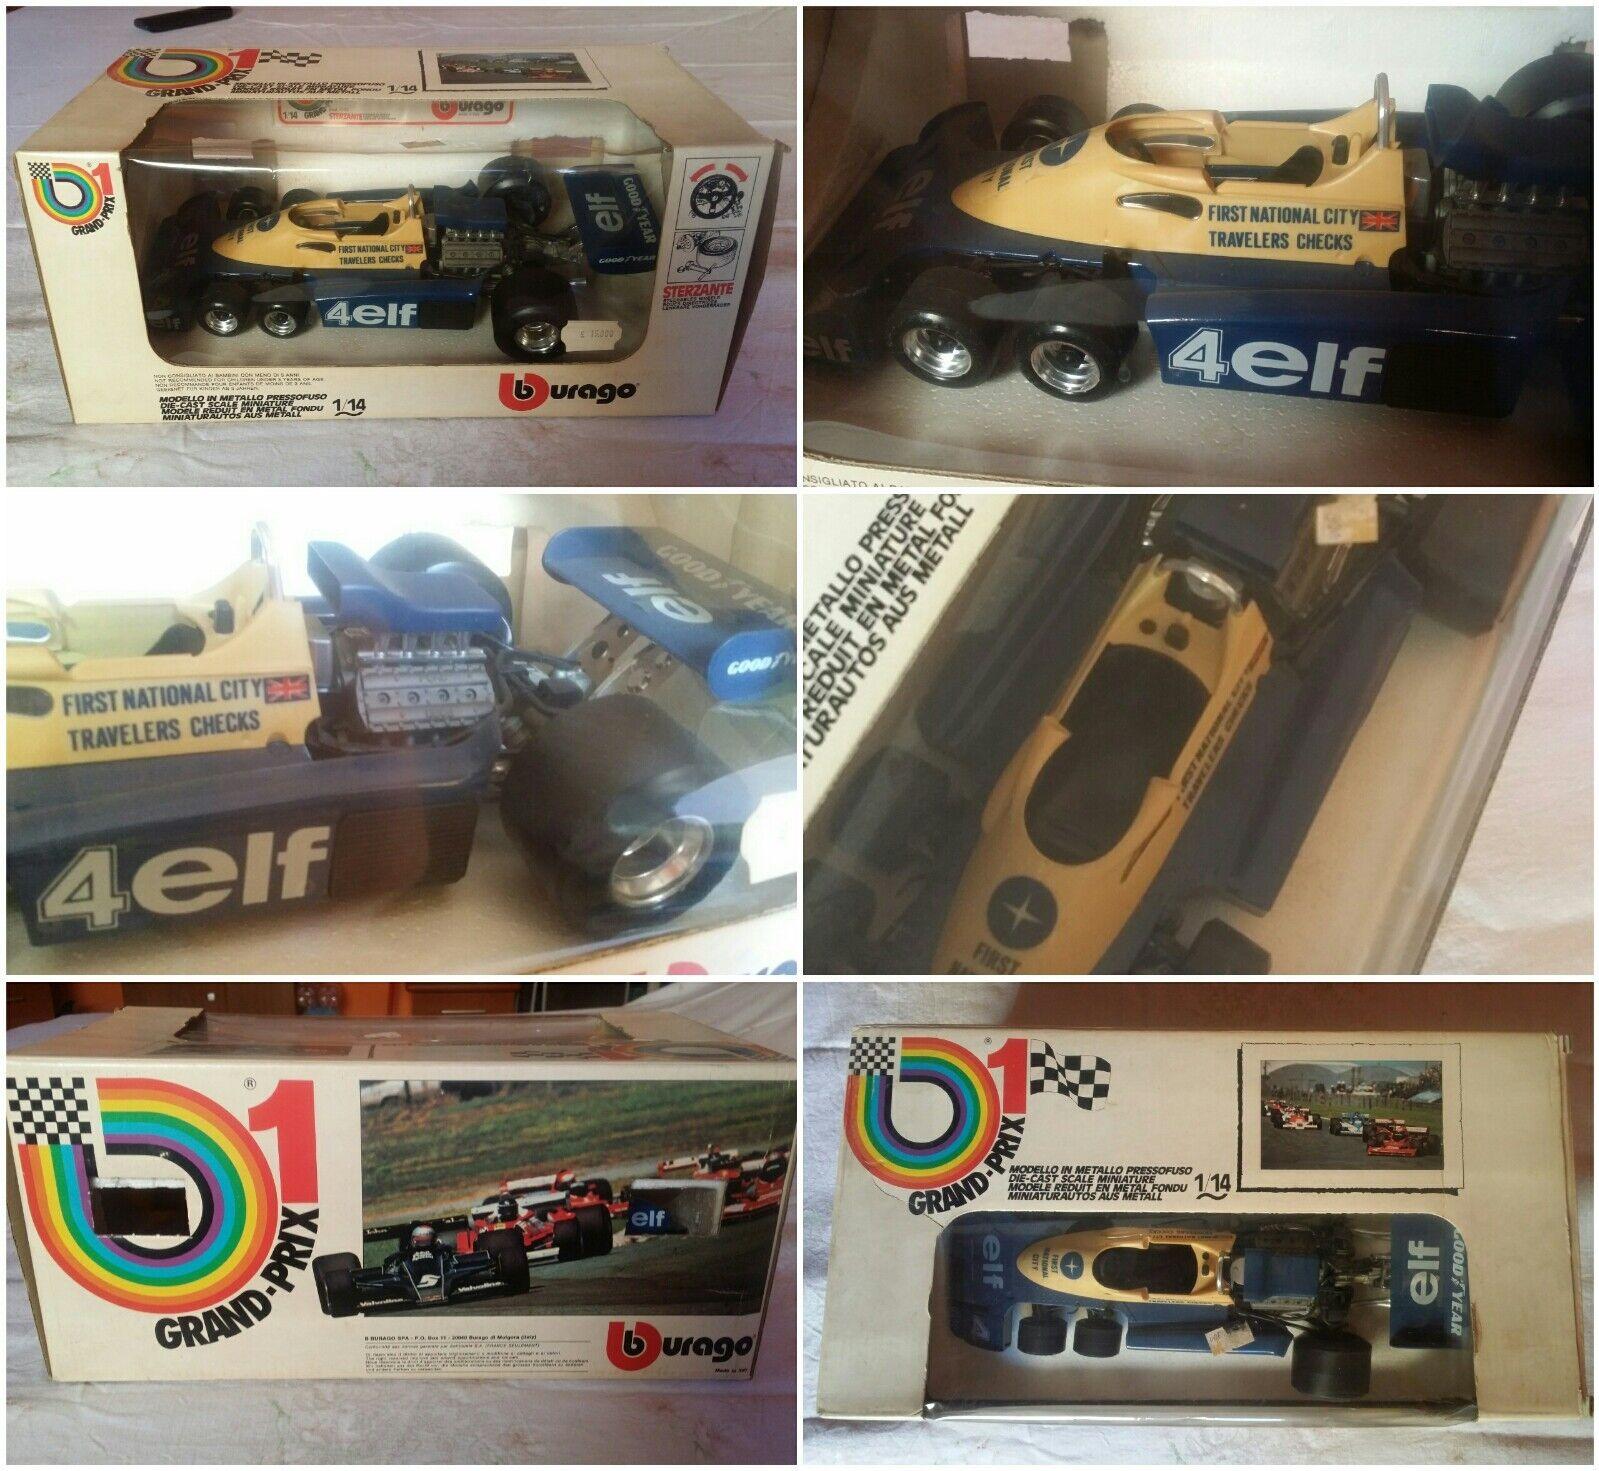 NH Burago Grand Prix 1- Tyrrell p34 2 - 1 14 - Rarissima anni '70 - Nuova 2102